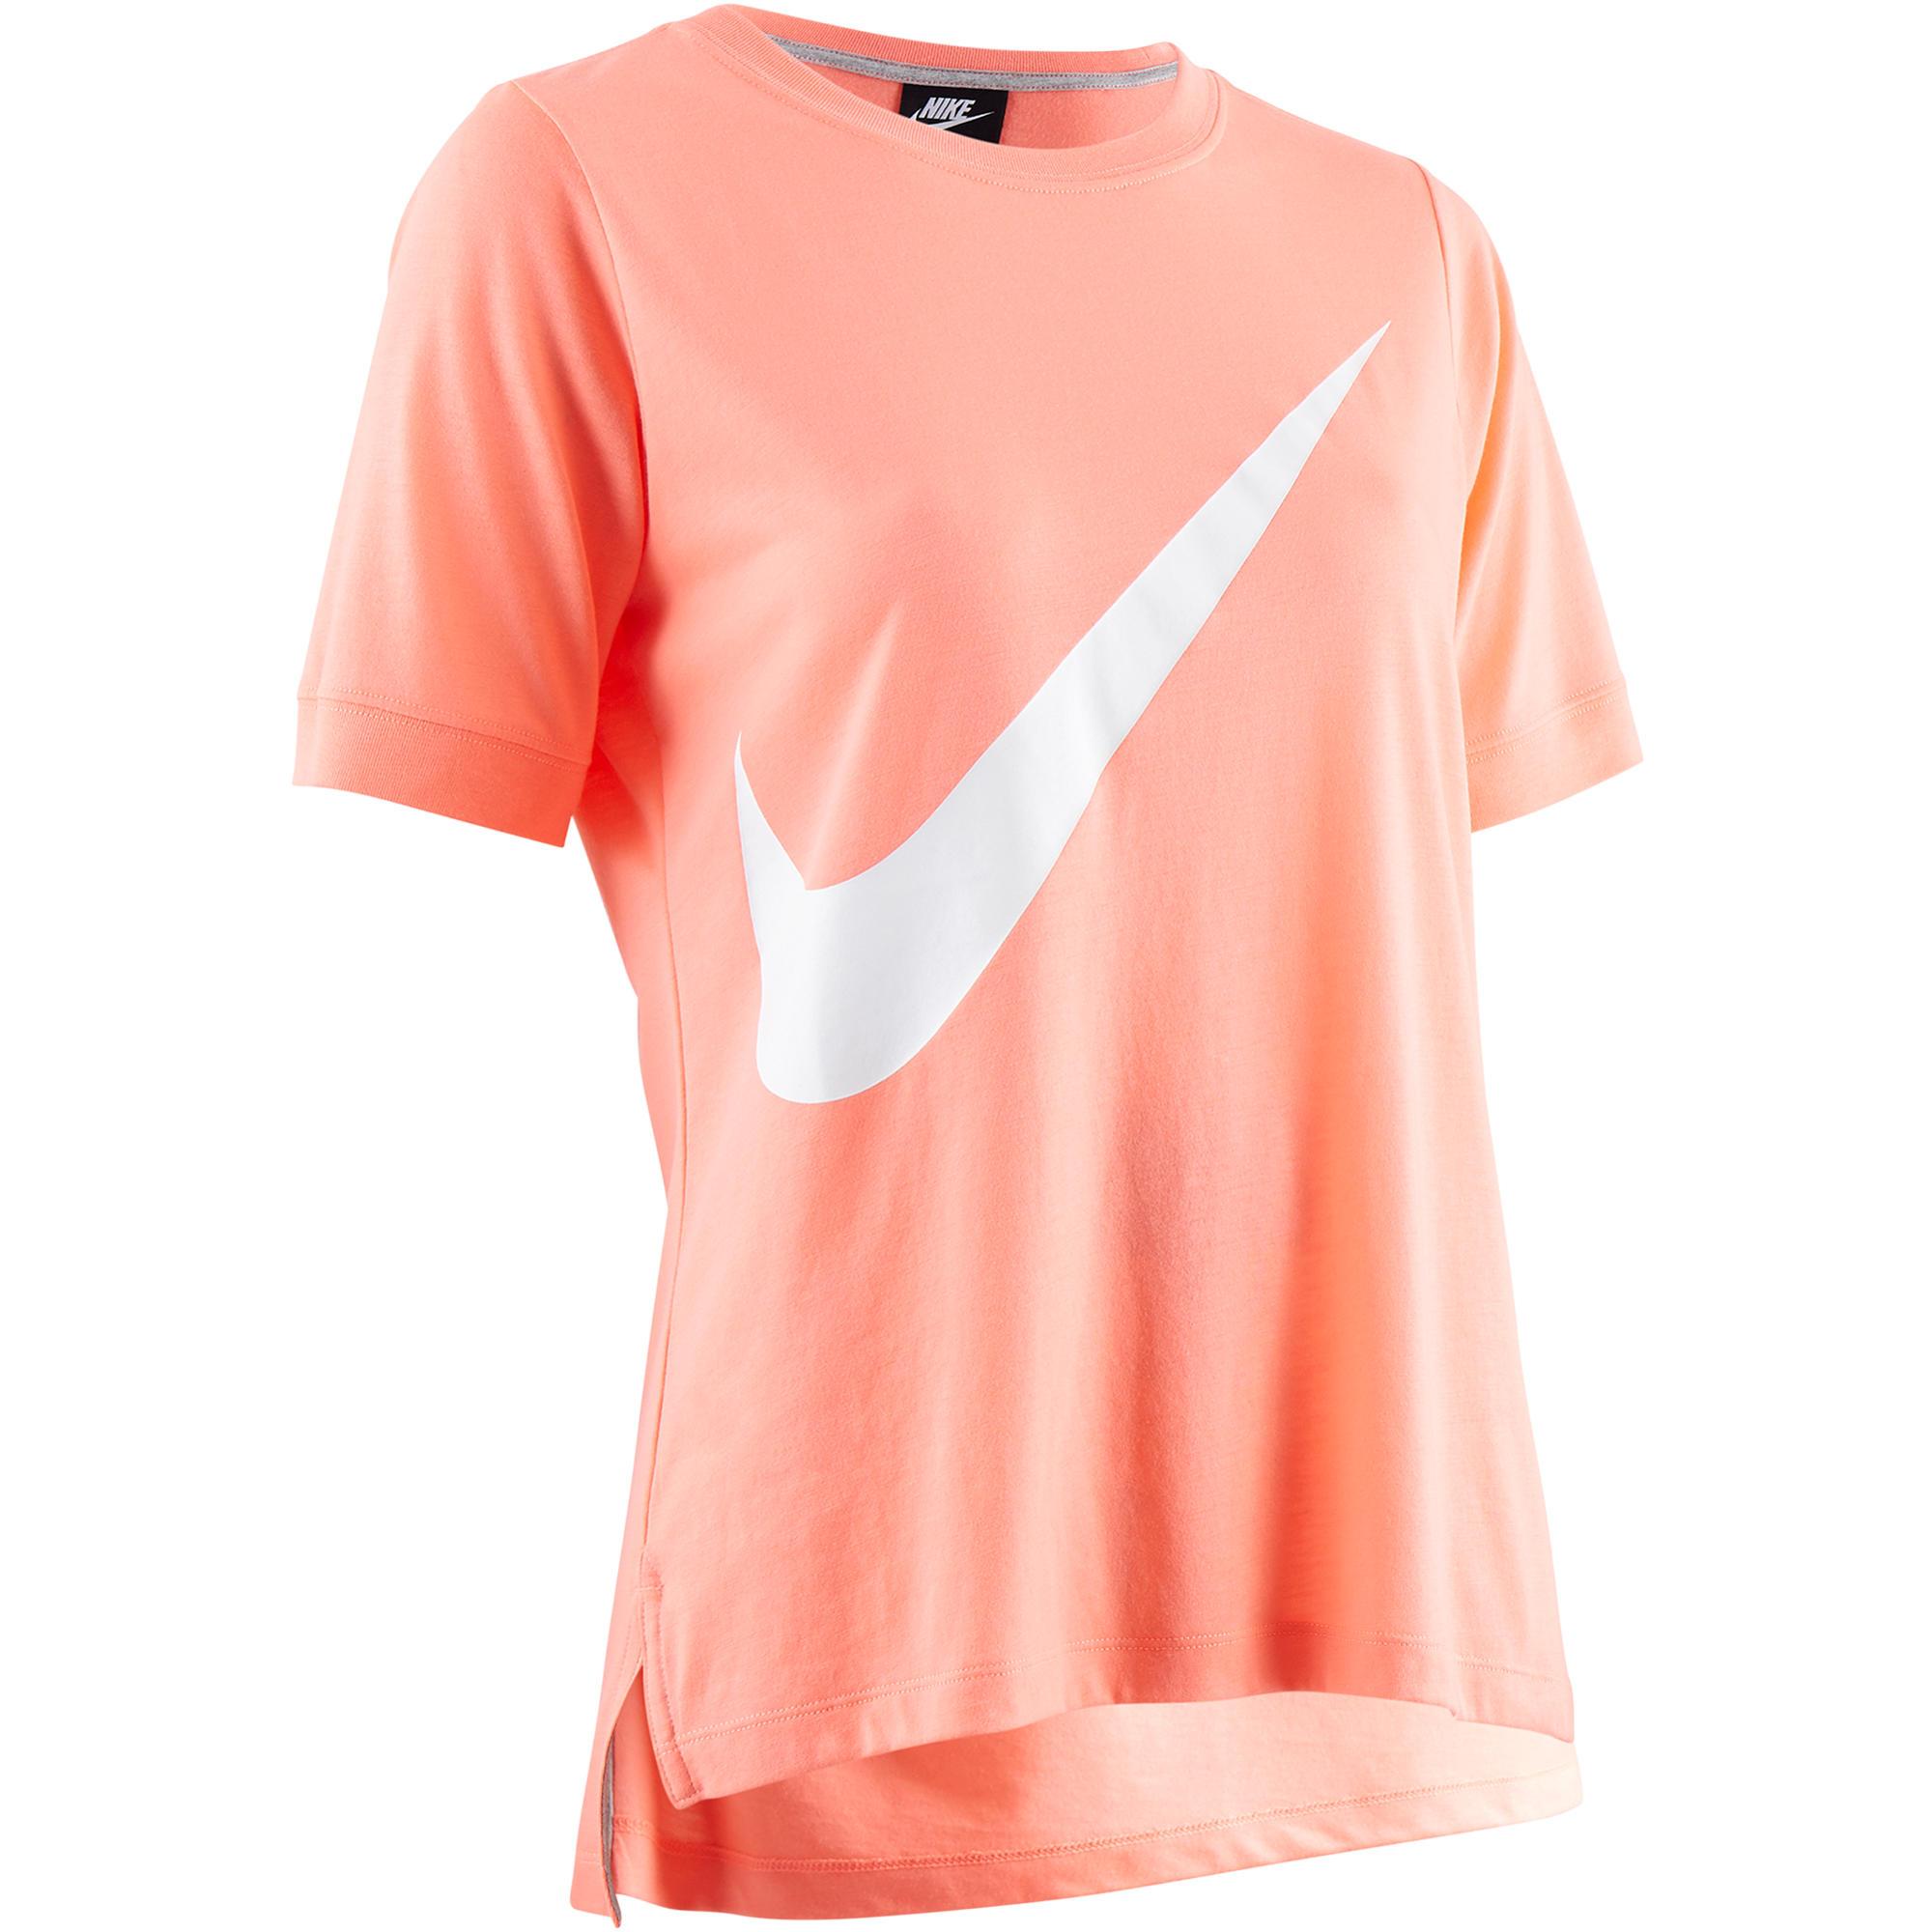 decathlon t shirt nike